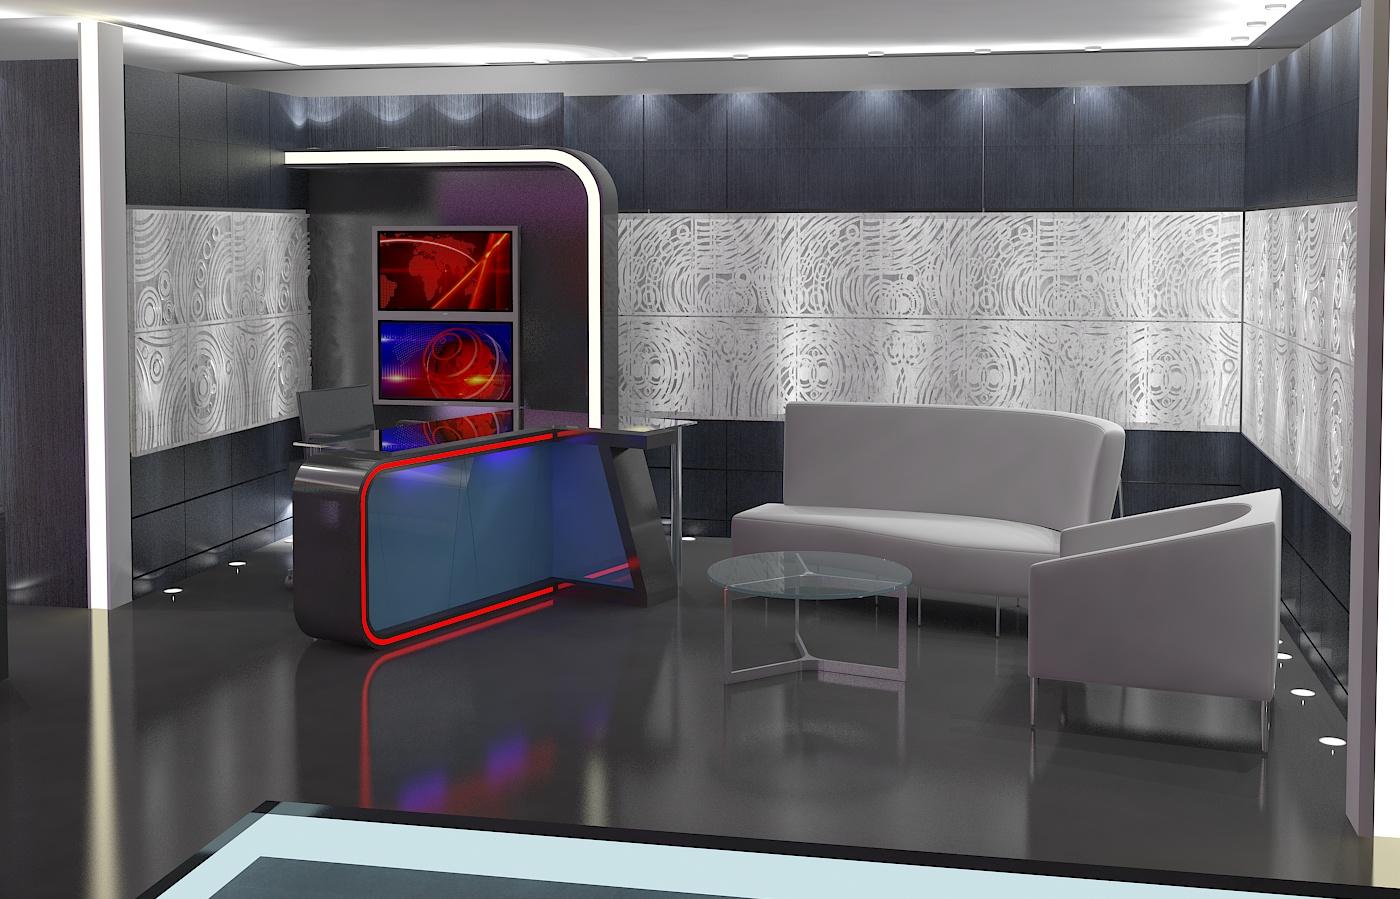 virtual tv studio news set 16 3d model 3ds max dxf fbx obj 223693